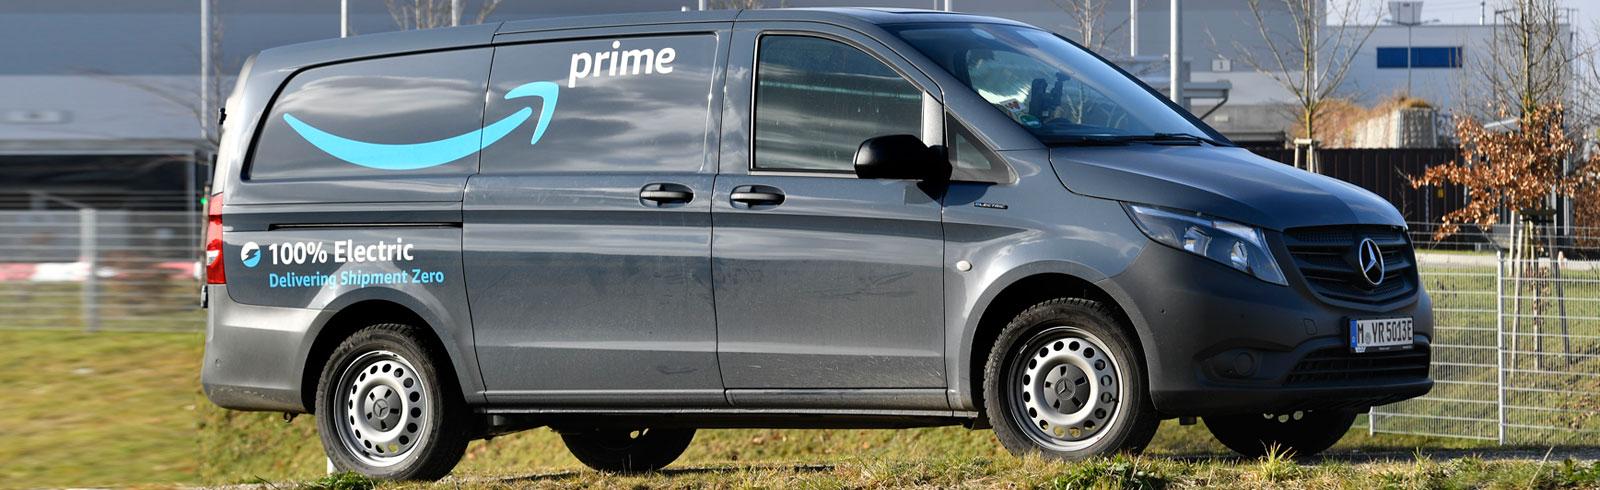 Amazon launches 10 Mercedes-Benz eVito vans in Munich